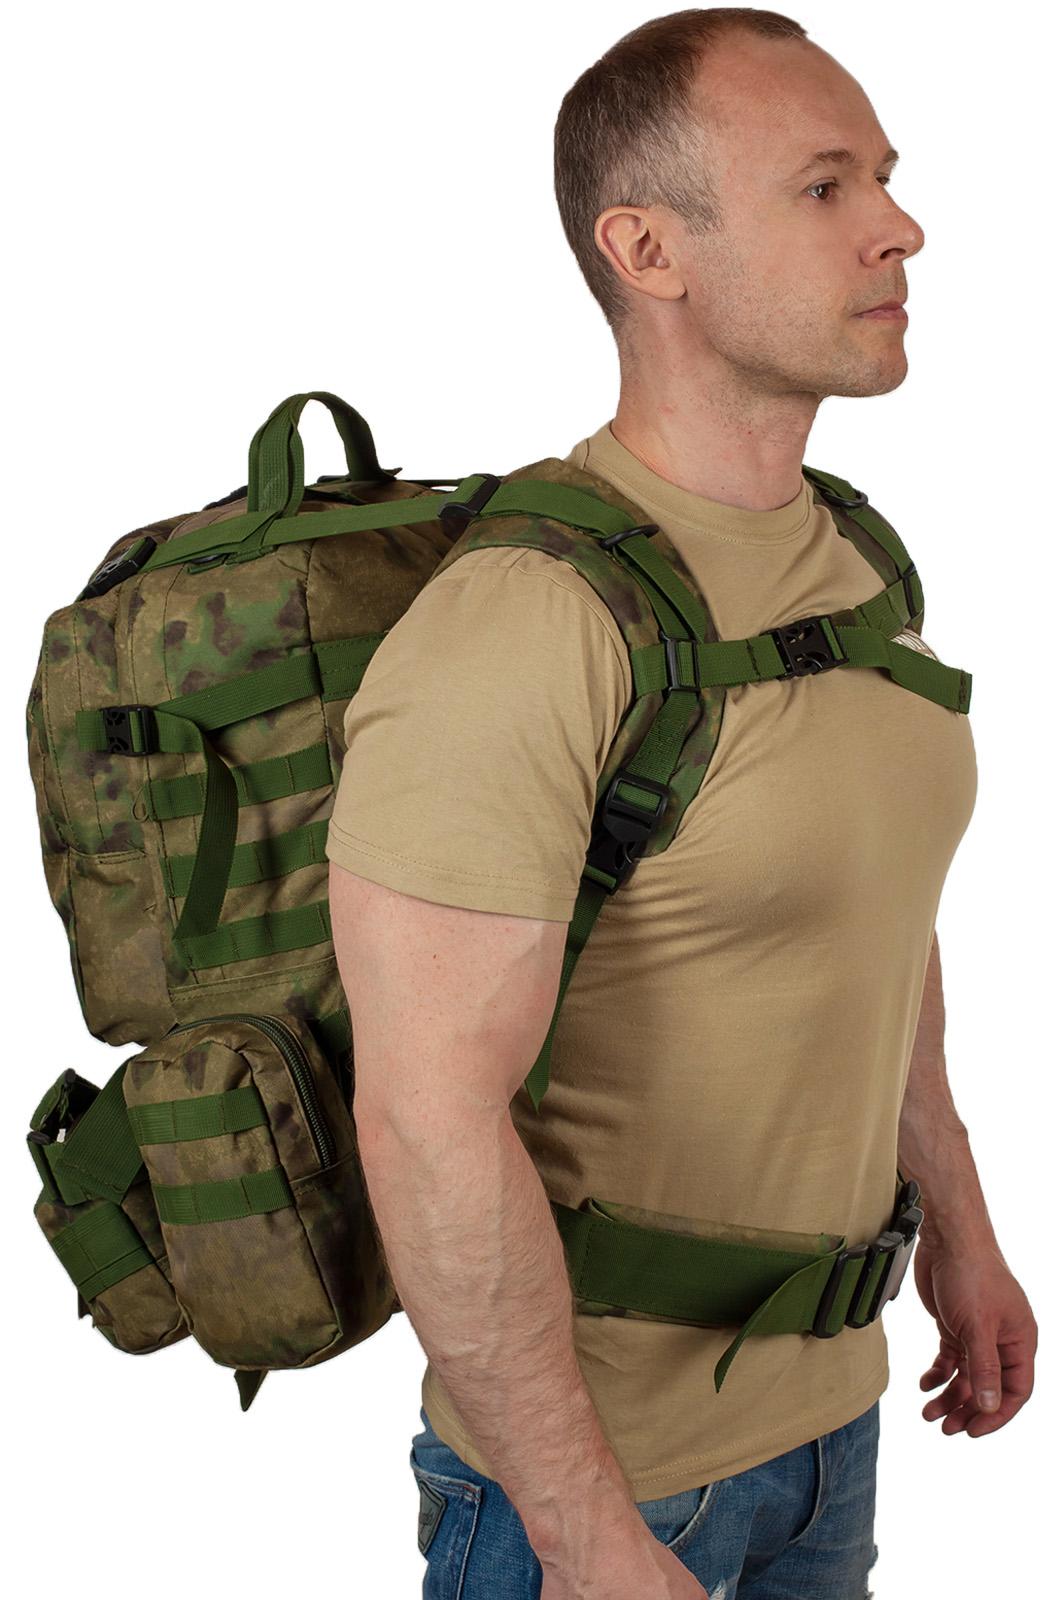 Армейские рюкзаки оптом и в розницу